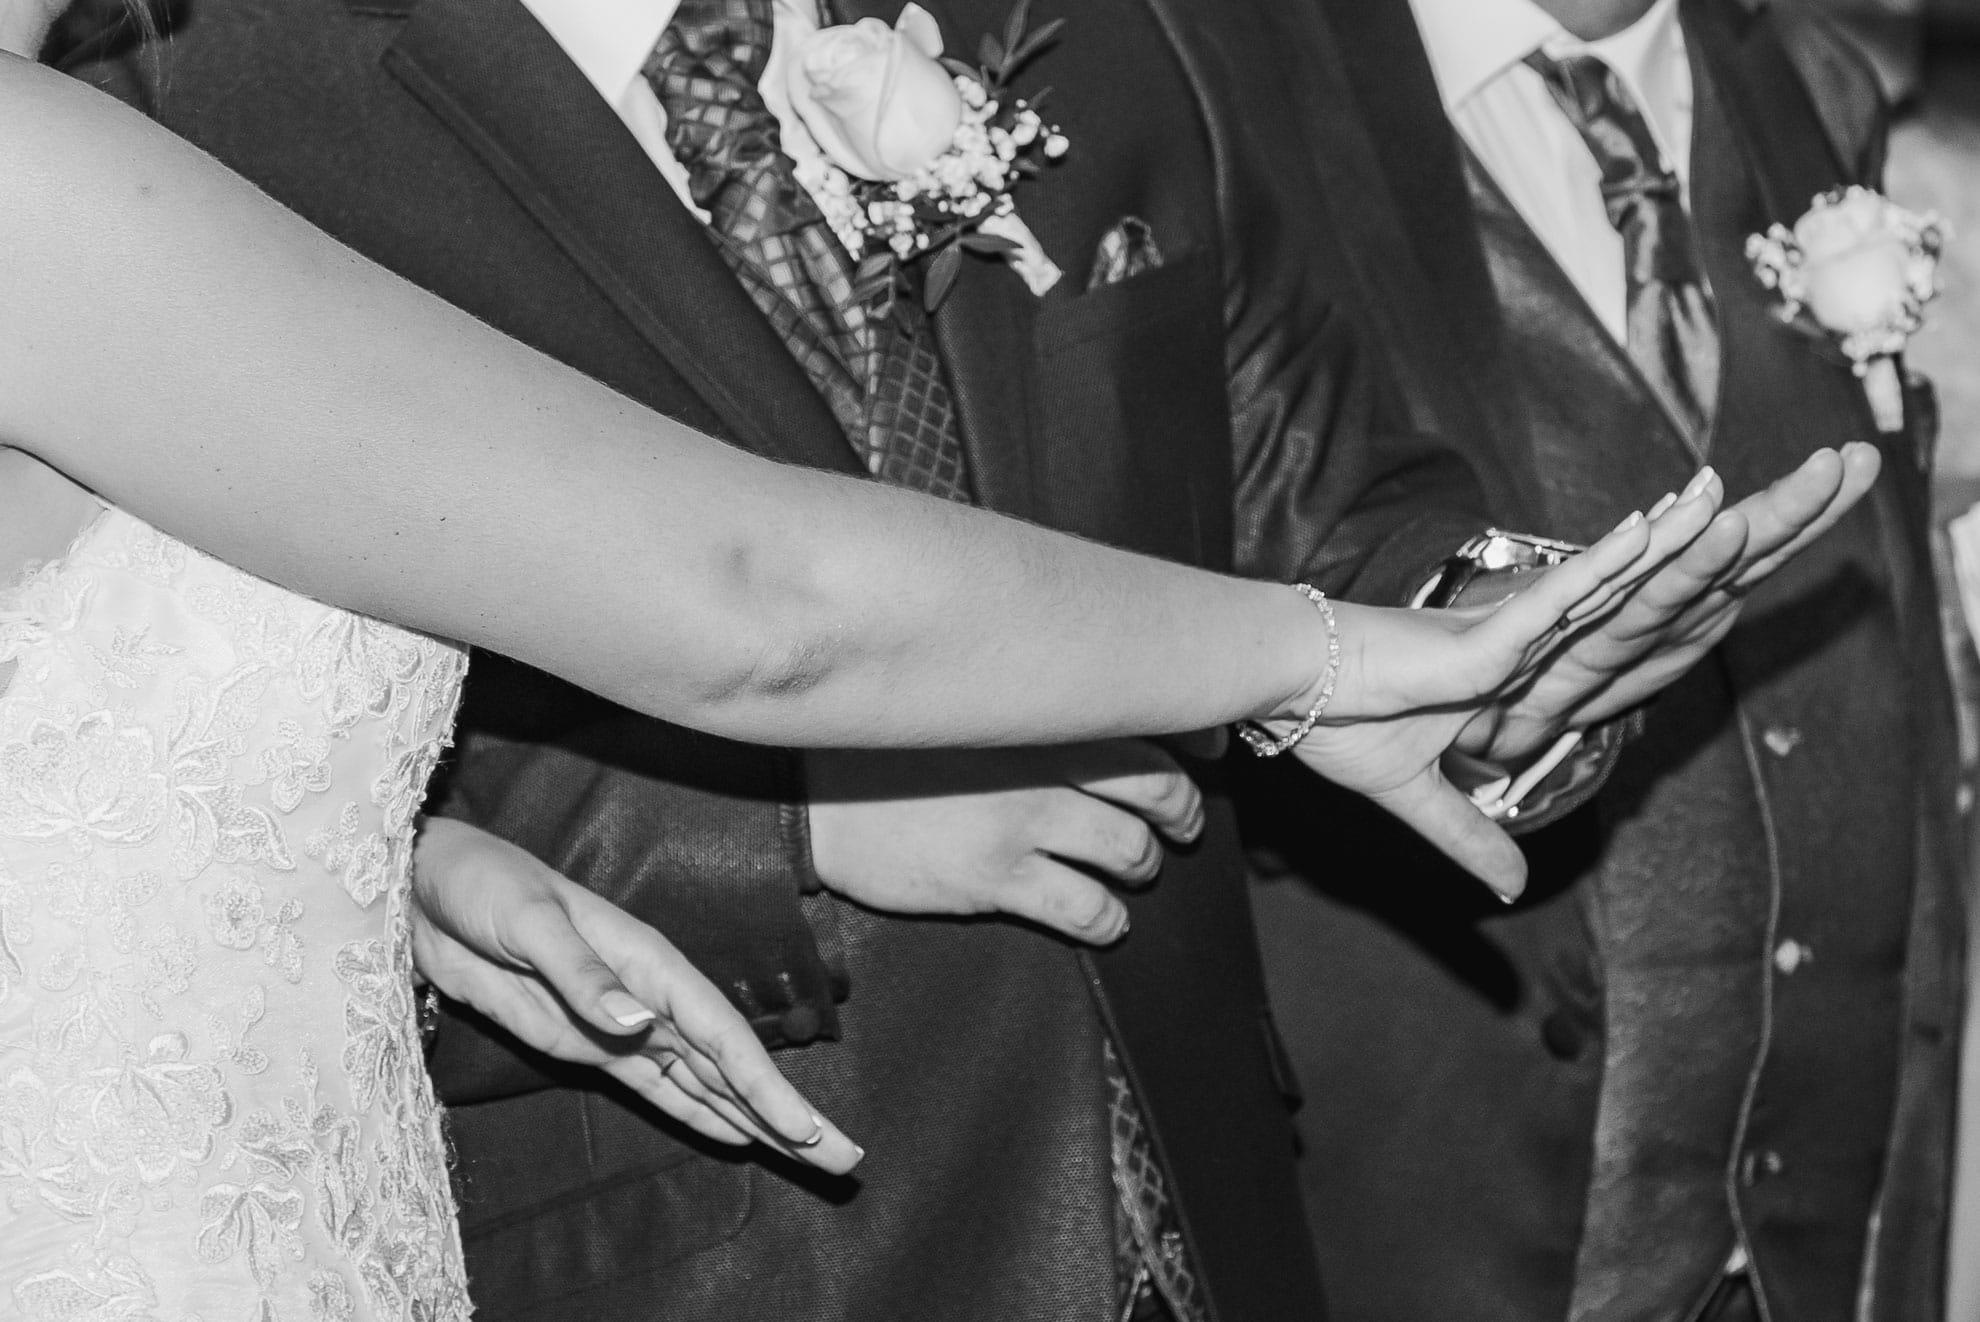 La fotógrafa de tu boda - Ana Porras Fotos y Bodas - Ahinoa y Fran